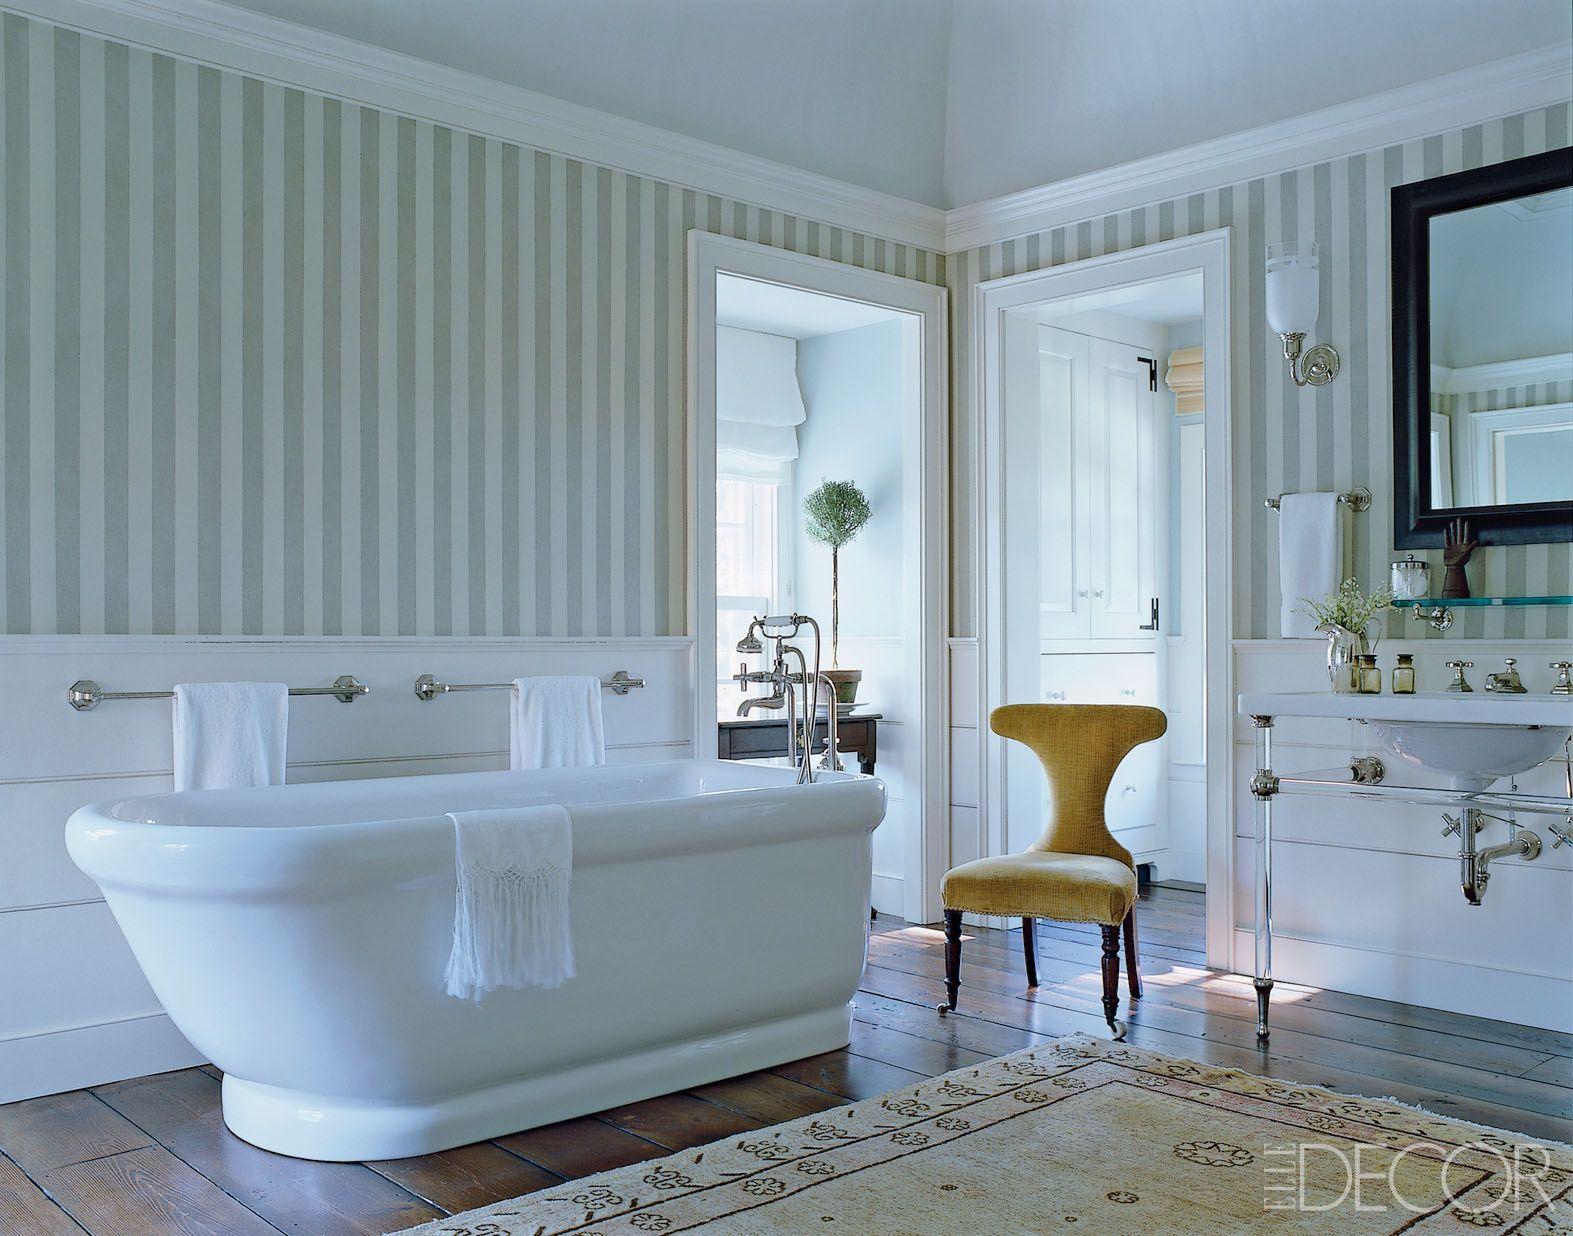 designer designs home pictures bathrooms images decoration brilliant creative bathroom gallery design